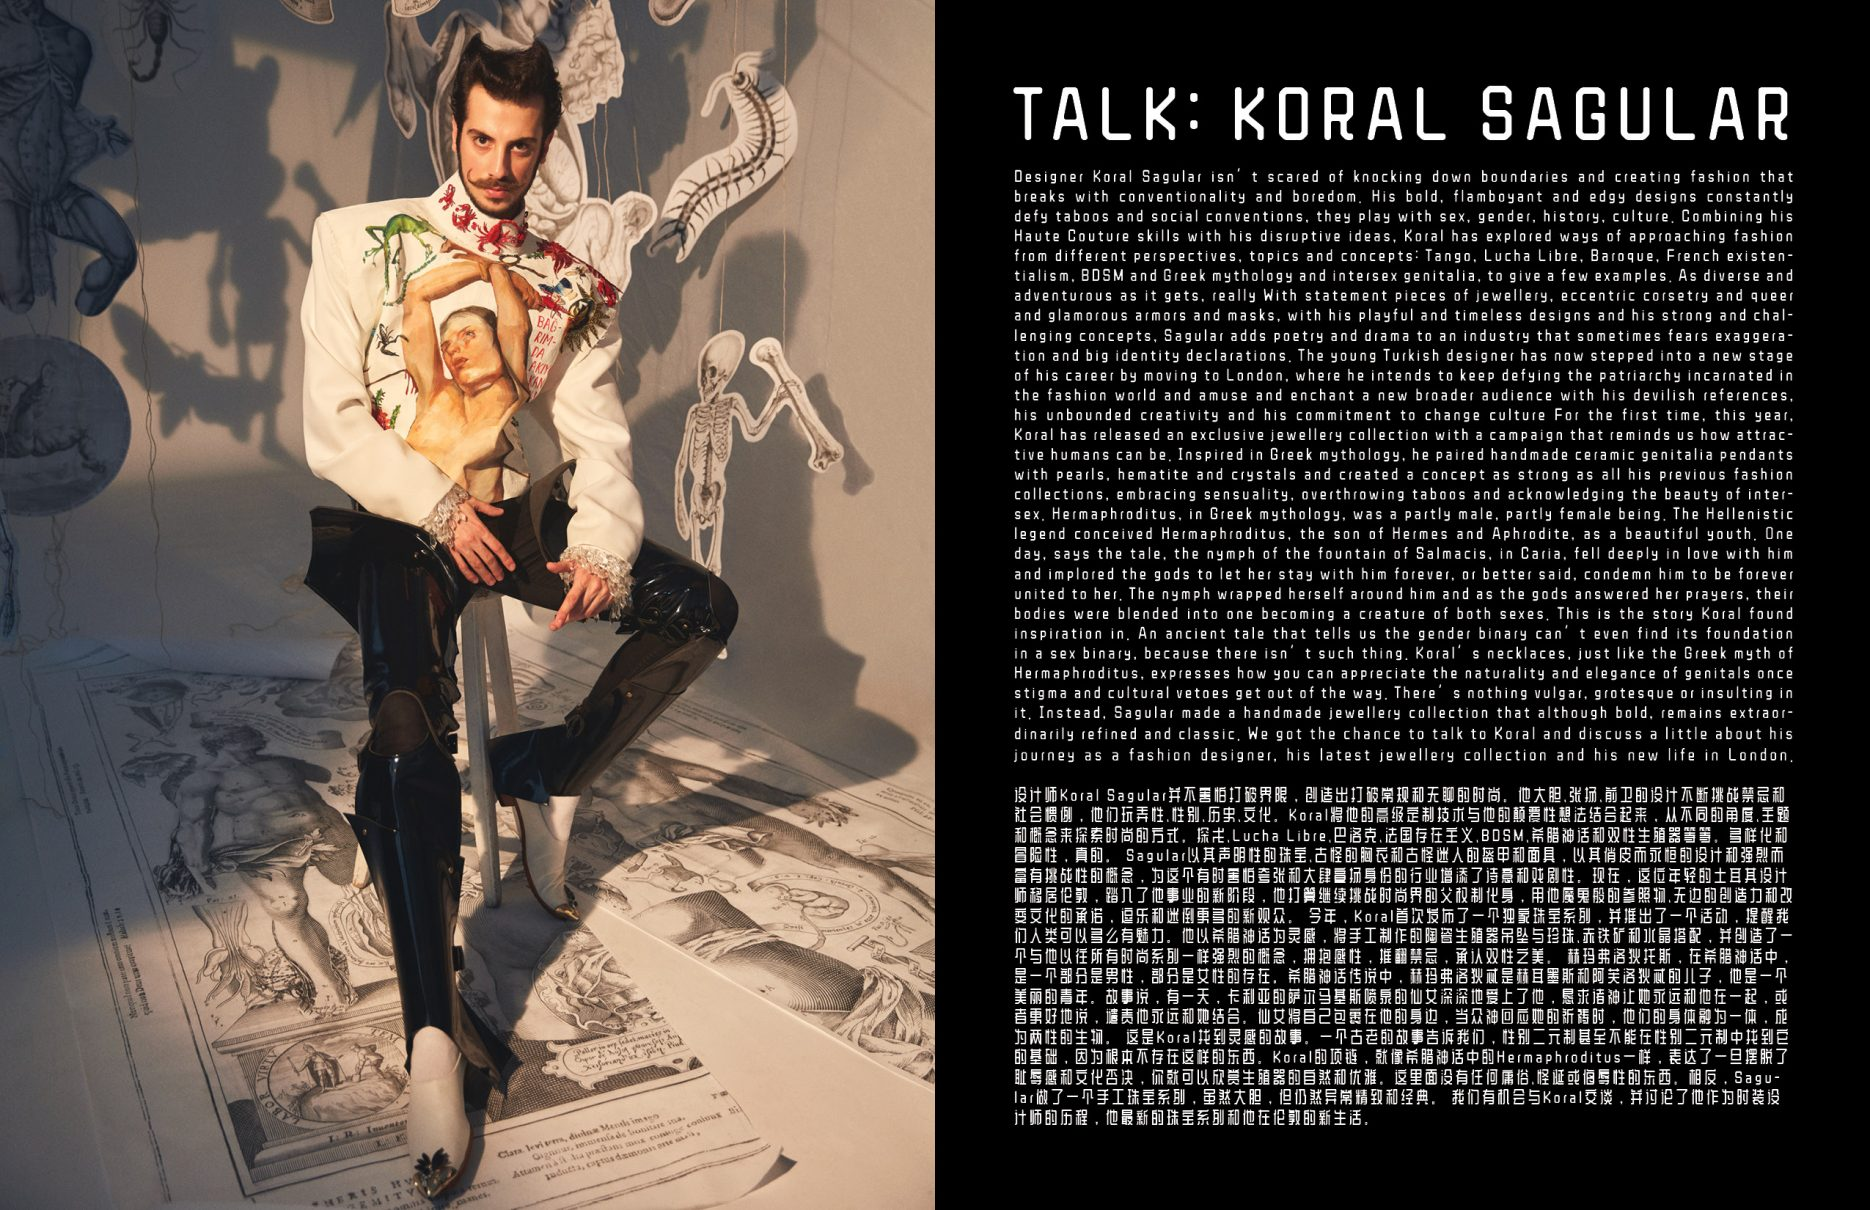 TALK with designer :KORAL SAGULAR by BECA MONTENGRO for Keyi Magazine Berlin / Fashion art music / magazine